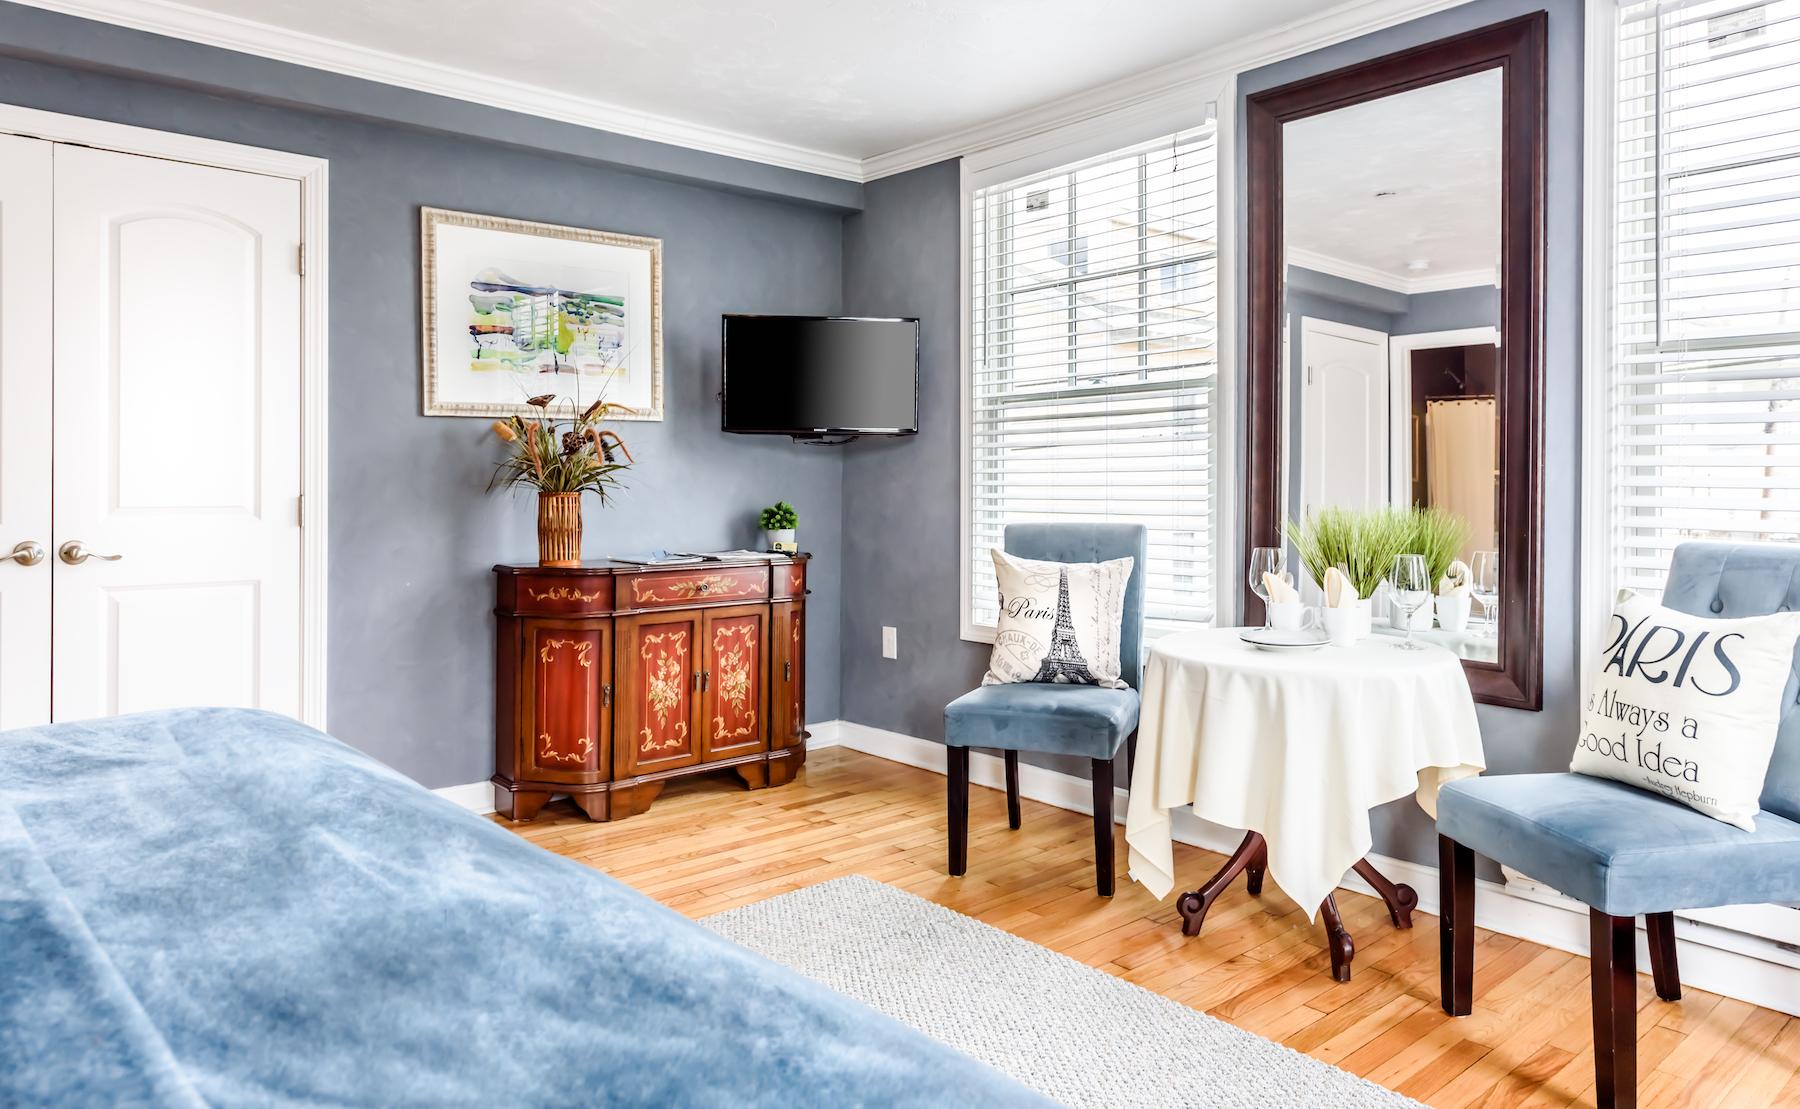 Inn-Room-15-and-Bathroom-20180316-002-Edit-1